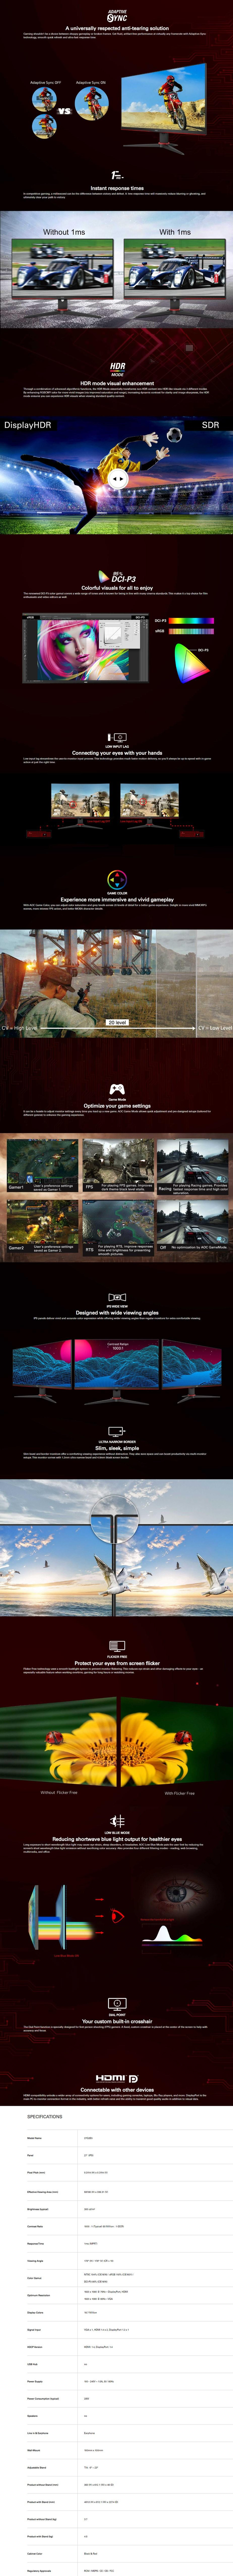 aoc-27g2e5-27-fhd-1ms-75hz-adaptive-sync-ips-gaming-monitor-ac31682-10.jpg